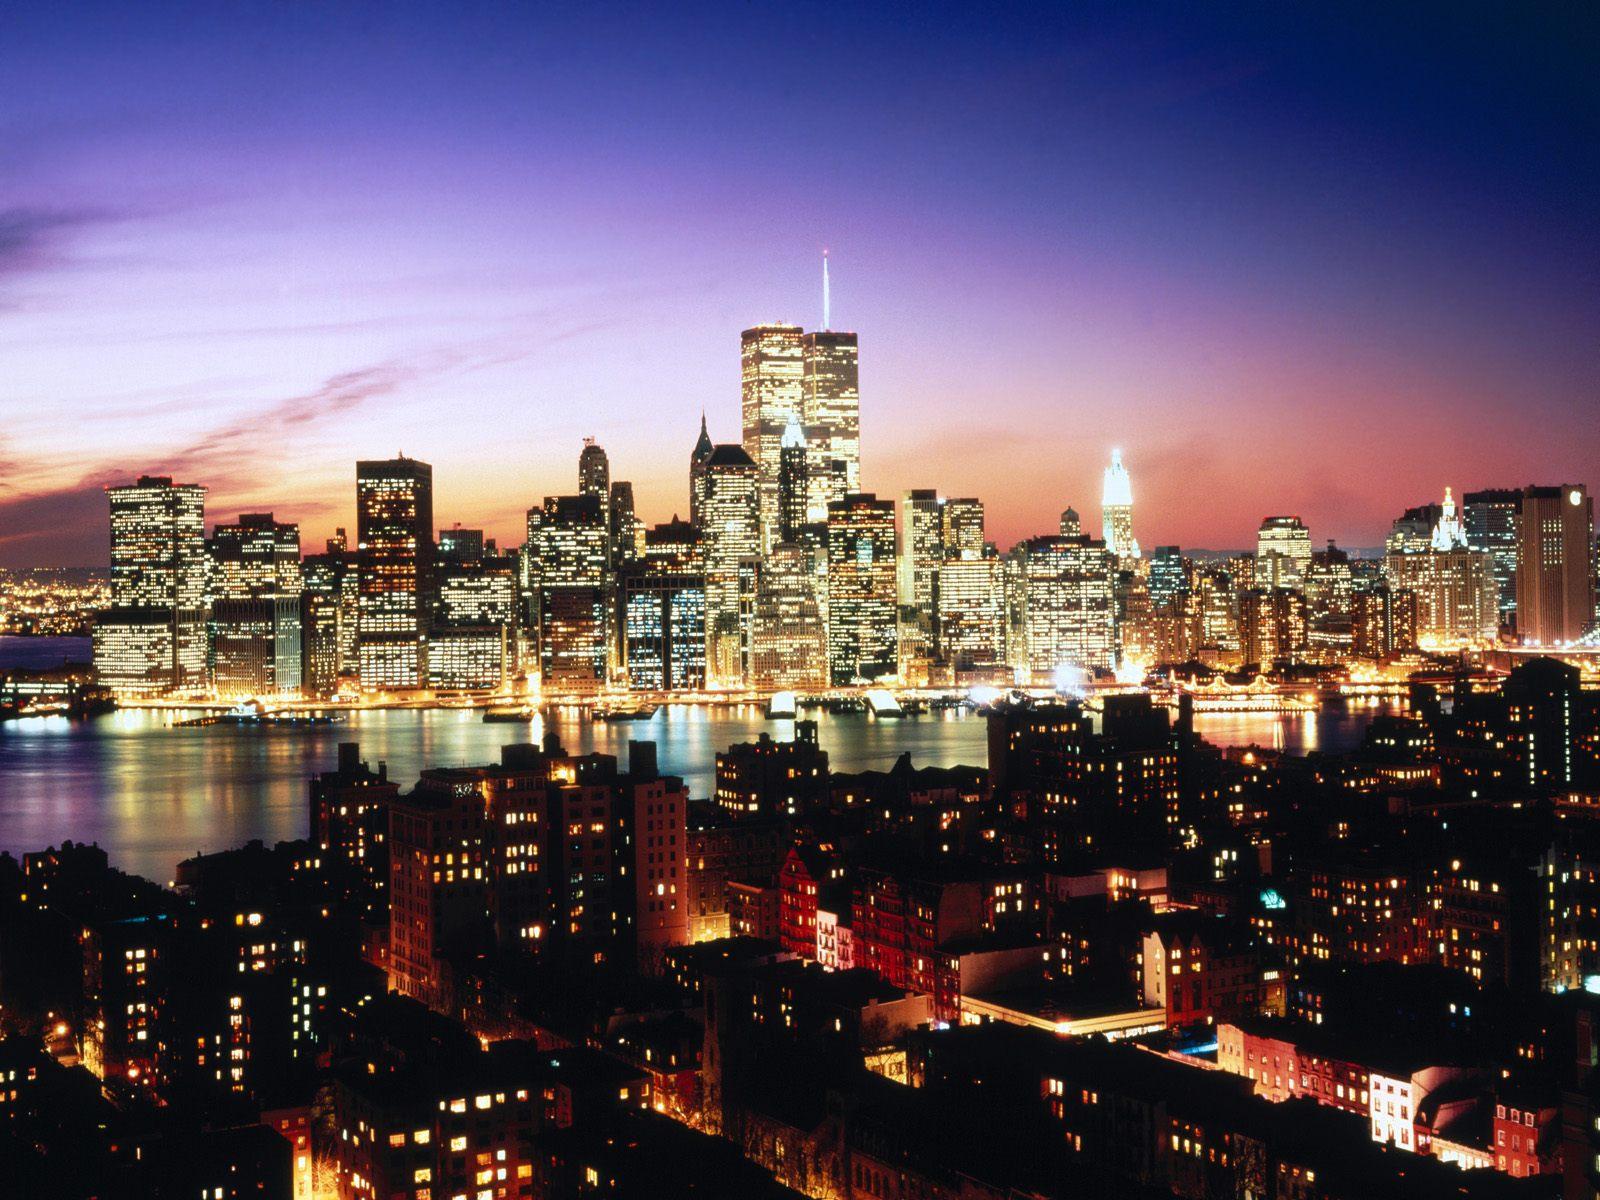 http://4.bp.blogspot.com/_WOWQJUlRtKQ/TRzOb9WgfXI/AAAAAAAABUo/bPwzOYOU214/s1600/newyork+city+tours+2.jpg